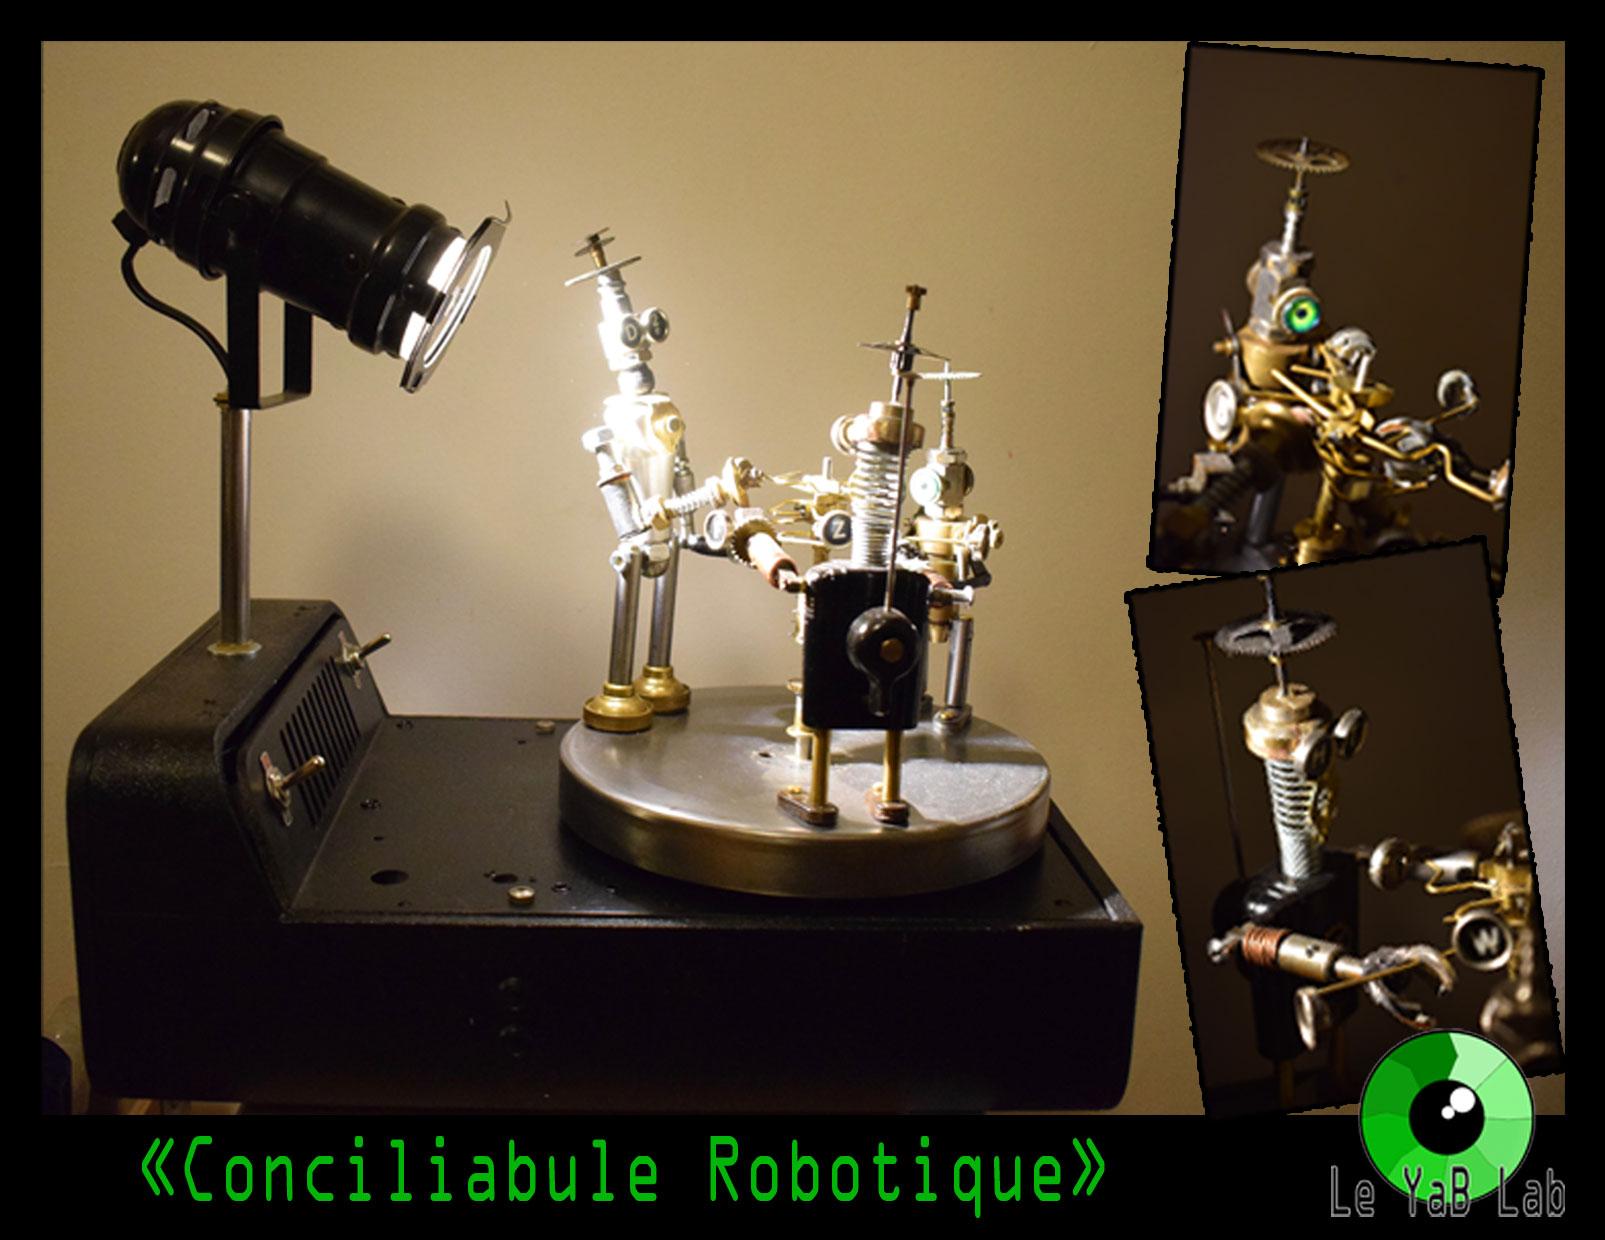 Conciliabule-Robotique